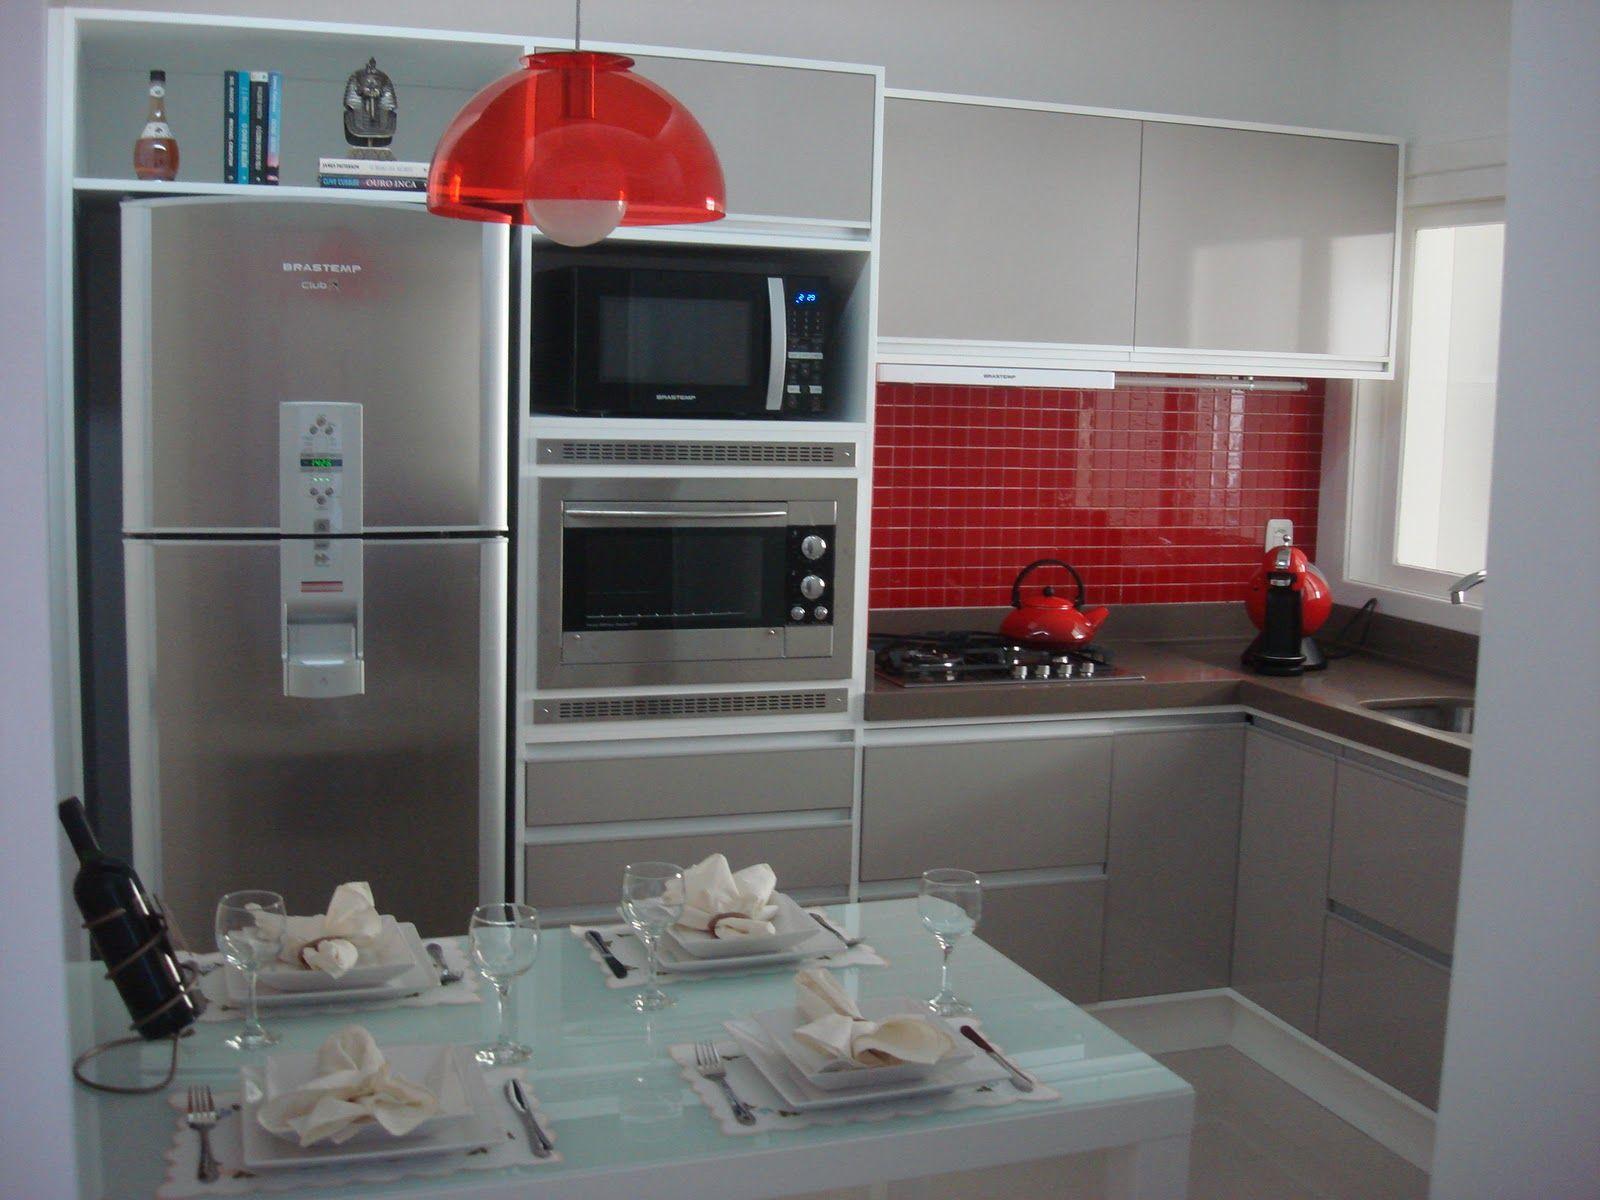 Pastilha Vermelha Cozinha Pesquisa Google Beauty Is In The Eyes